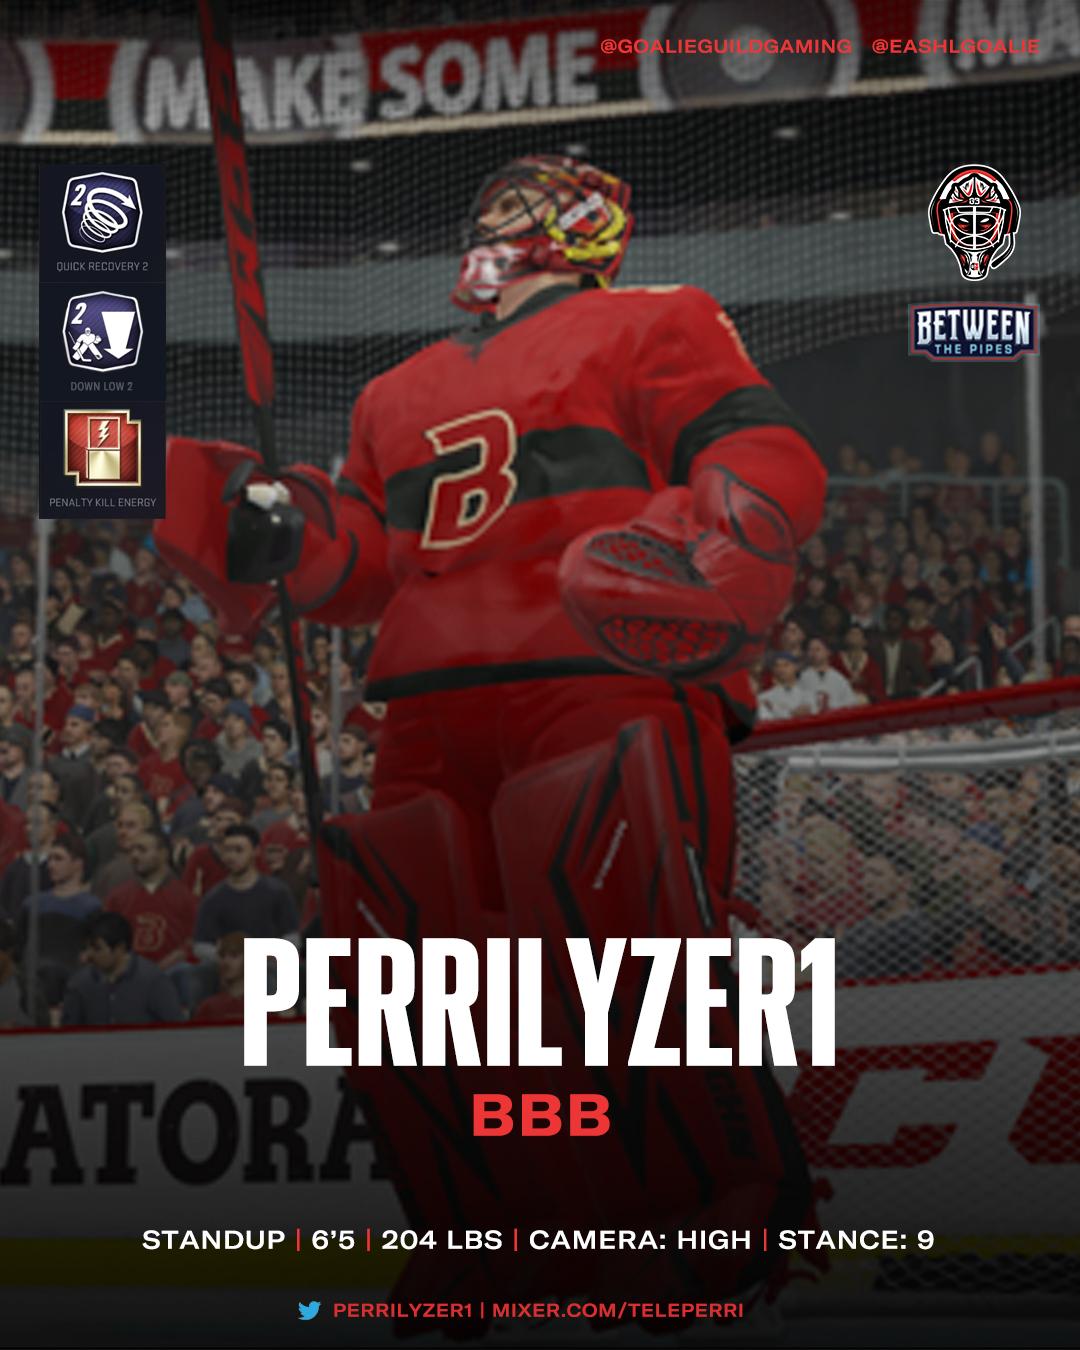 G3 Builds: Perrilyzer